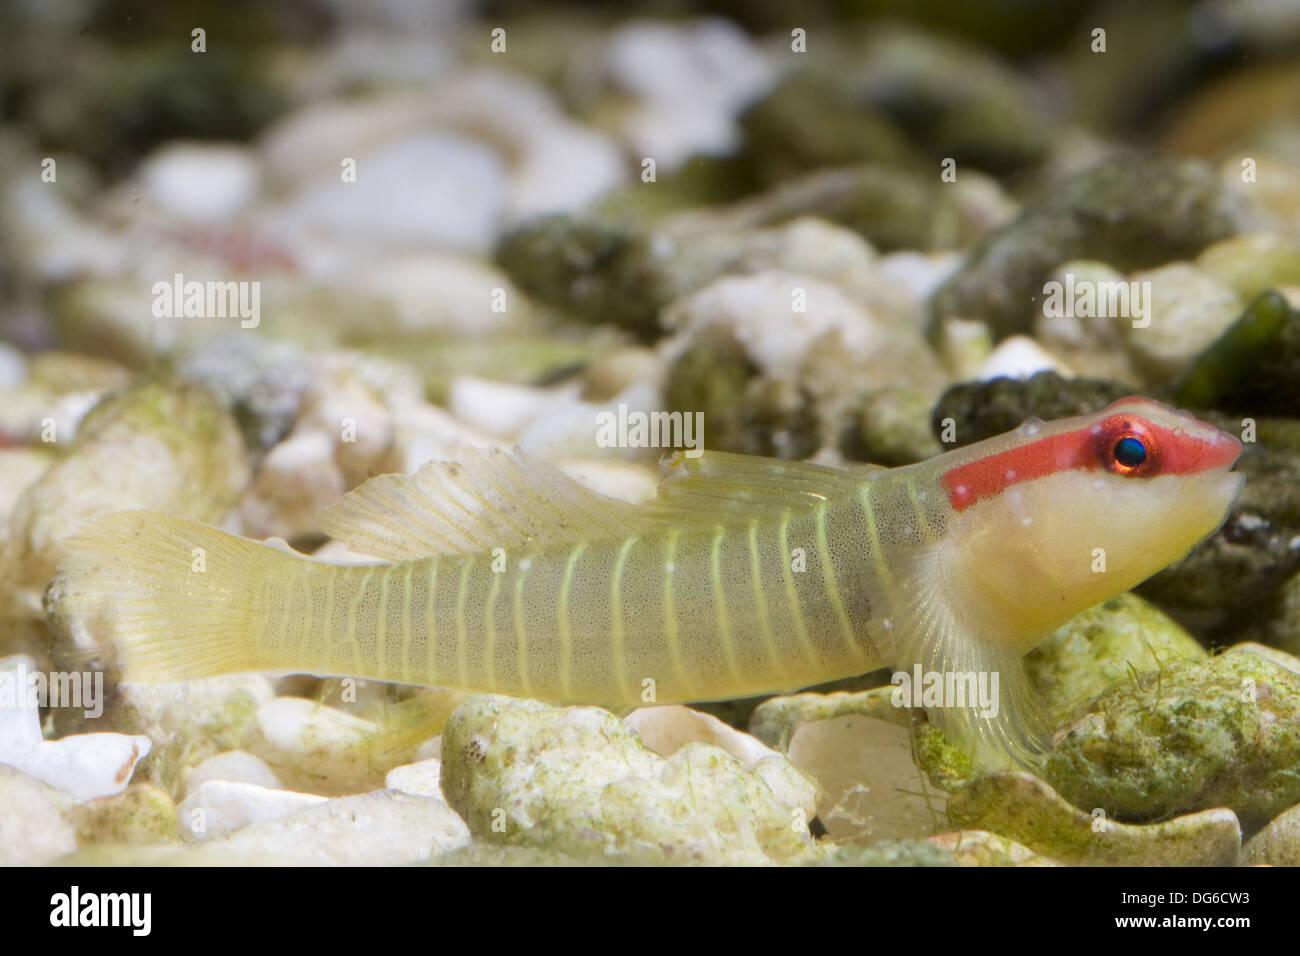 greenbanded goby, elacatinus multifasciatus - Stock Image